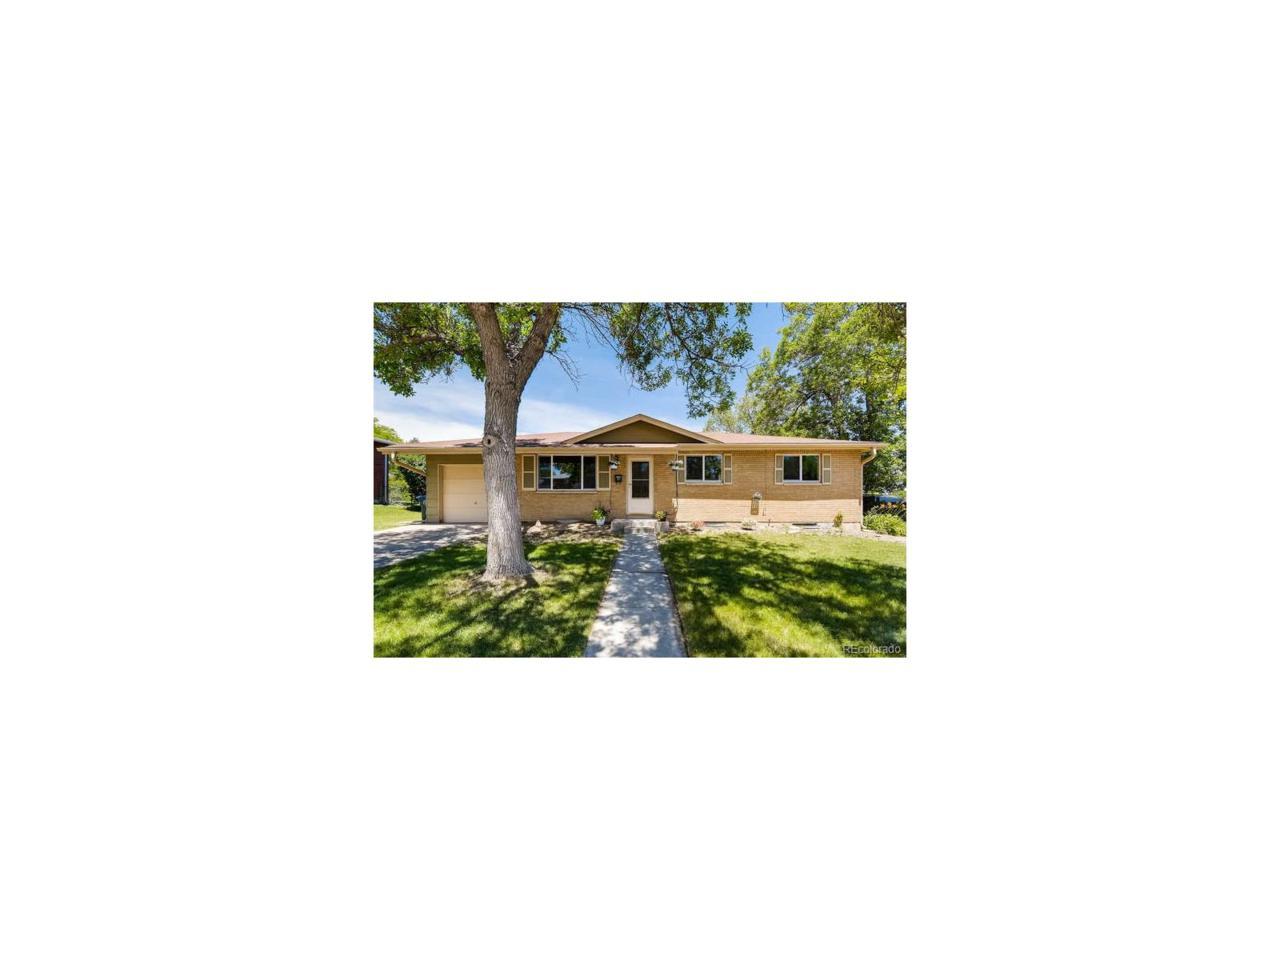 1023 W 100th Place, Northglenn, CO 80260 (MLS #4652829) :: 8z Real Estate